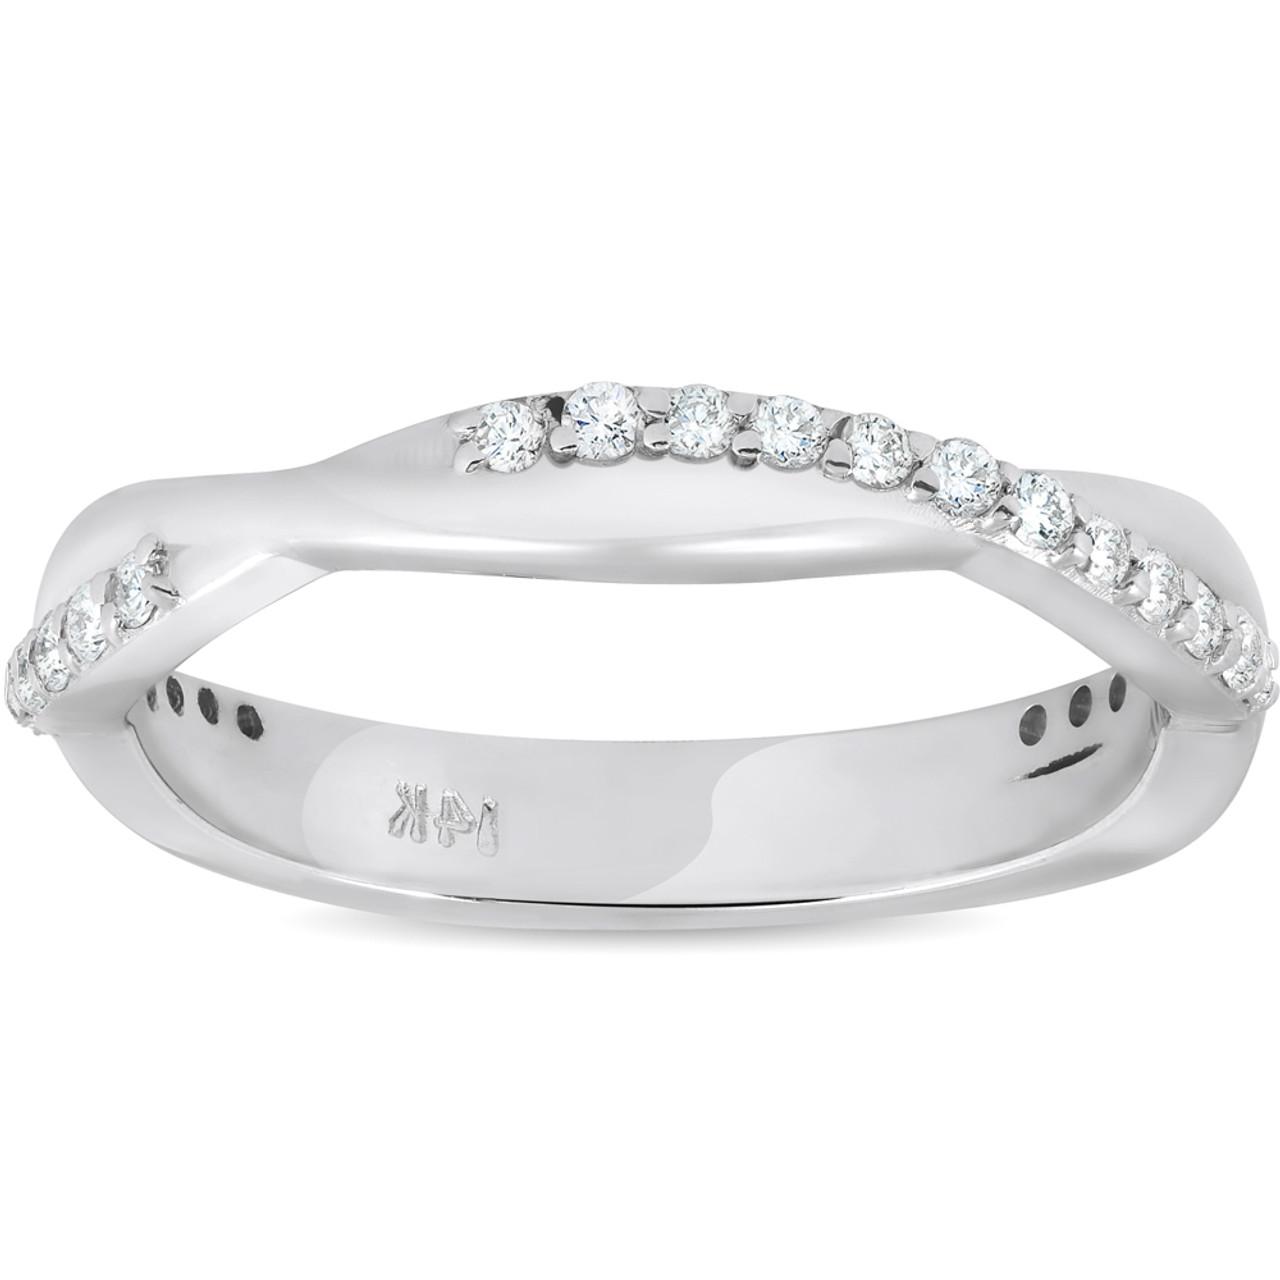 Womens Wedding Rings.1 4 Ct Diamond Twisted Vine Womens Wedding Ring 14k White Gold H I I1 I2